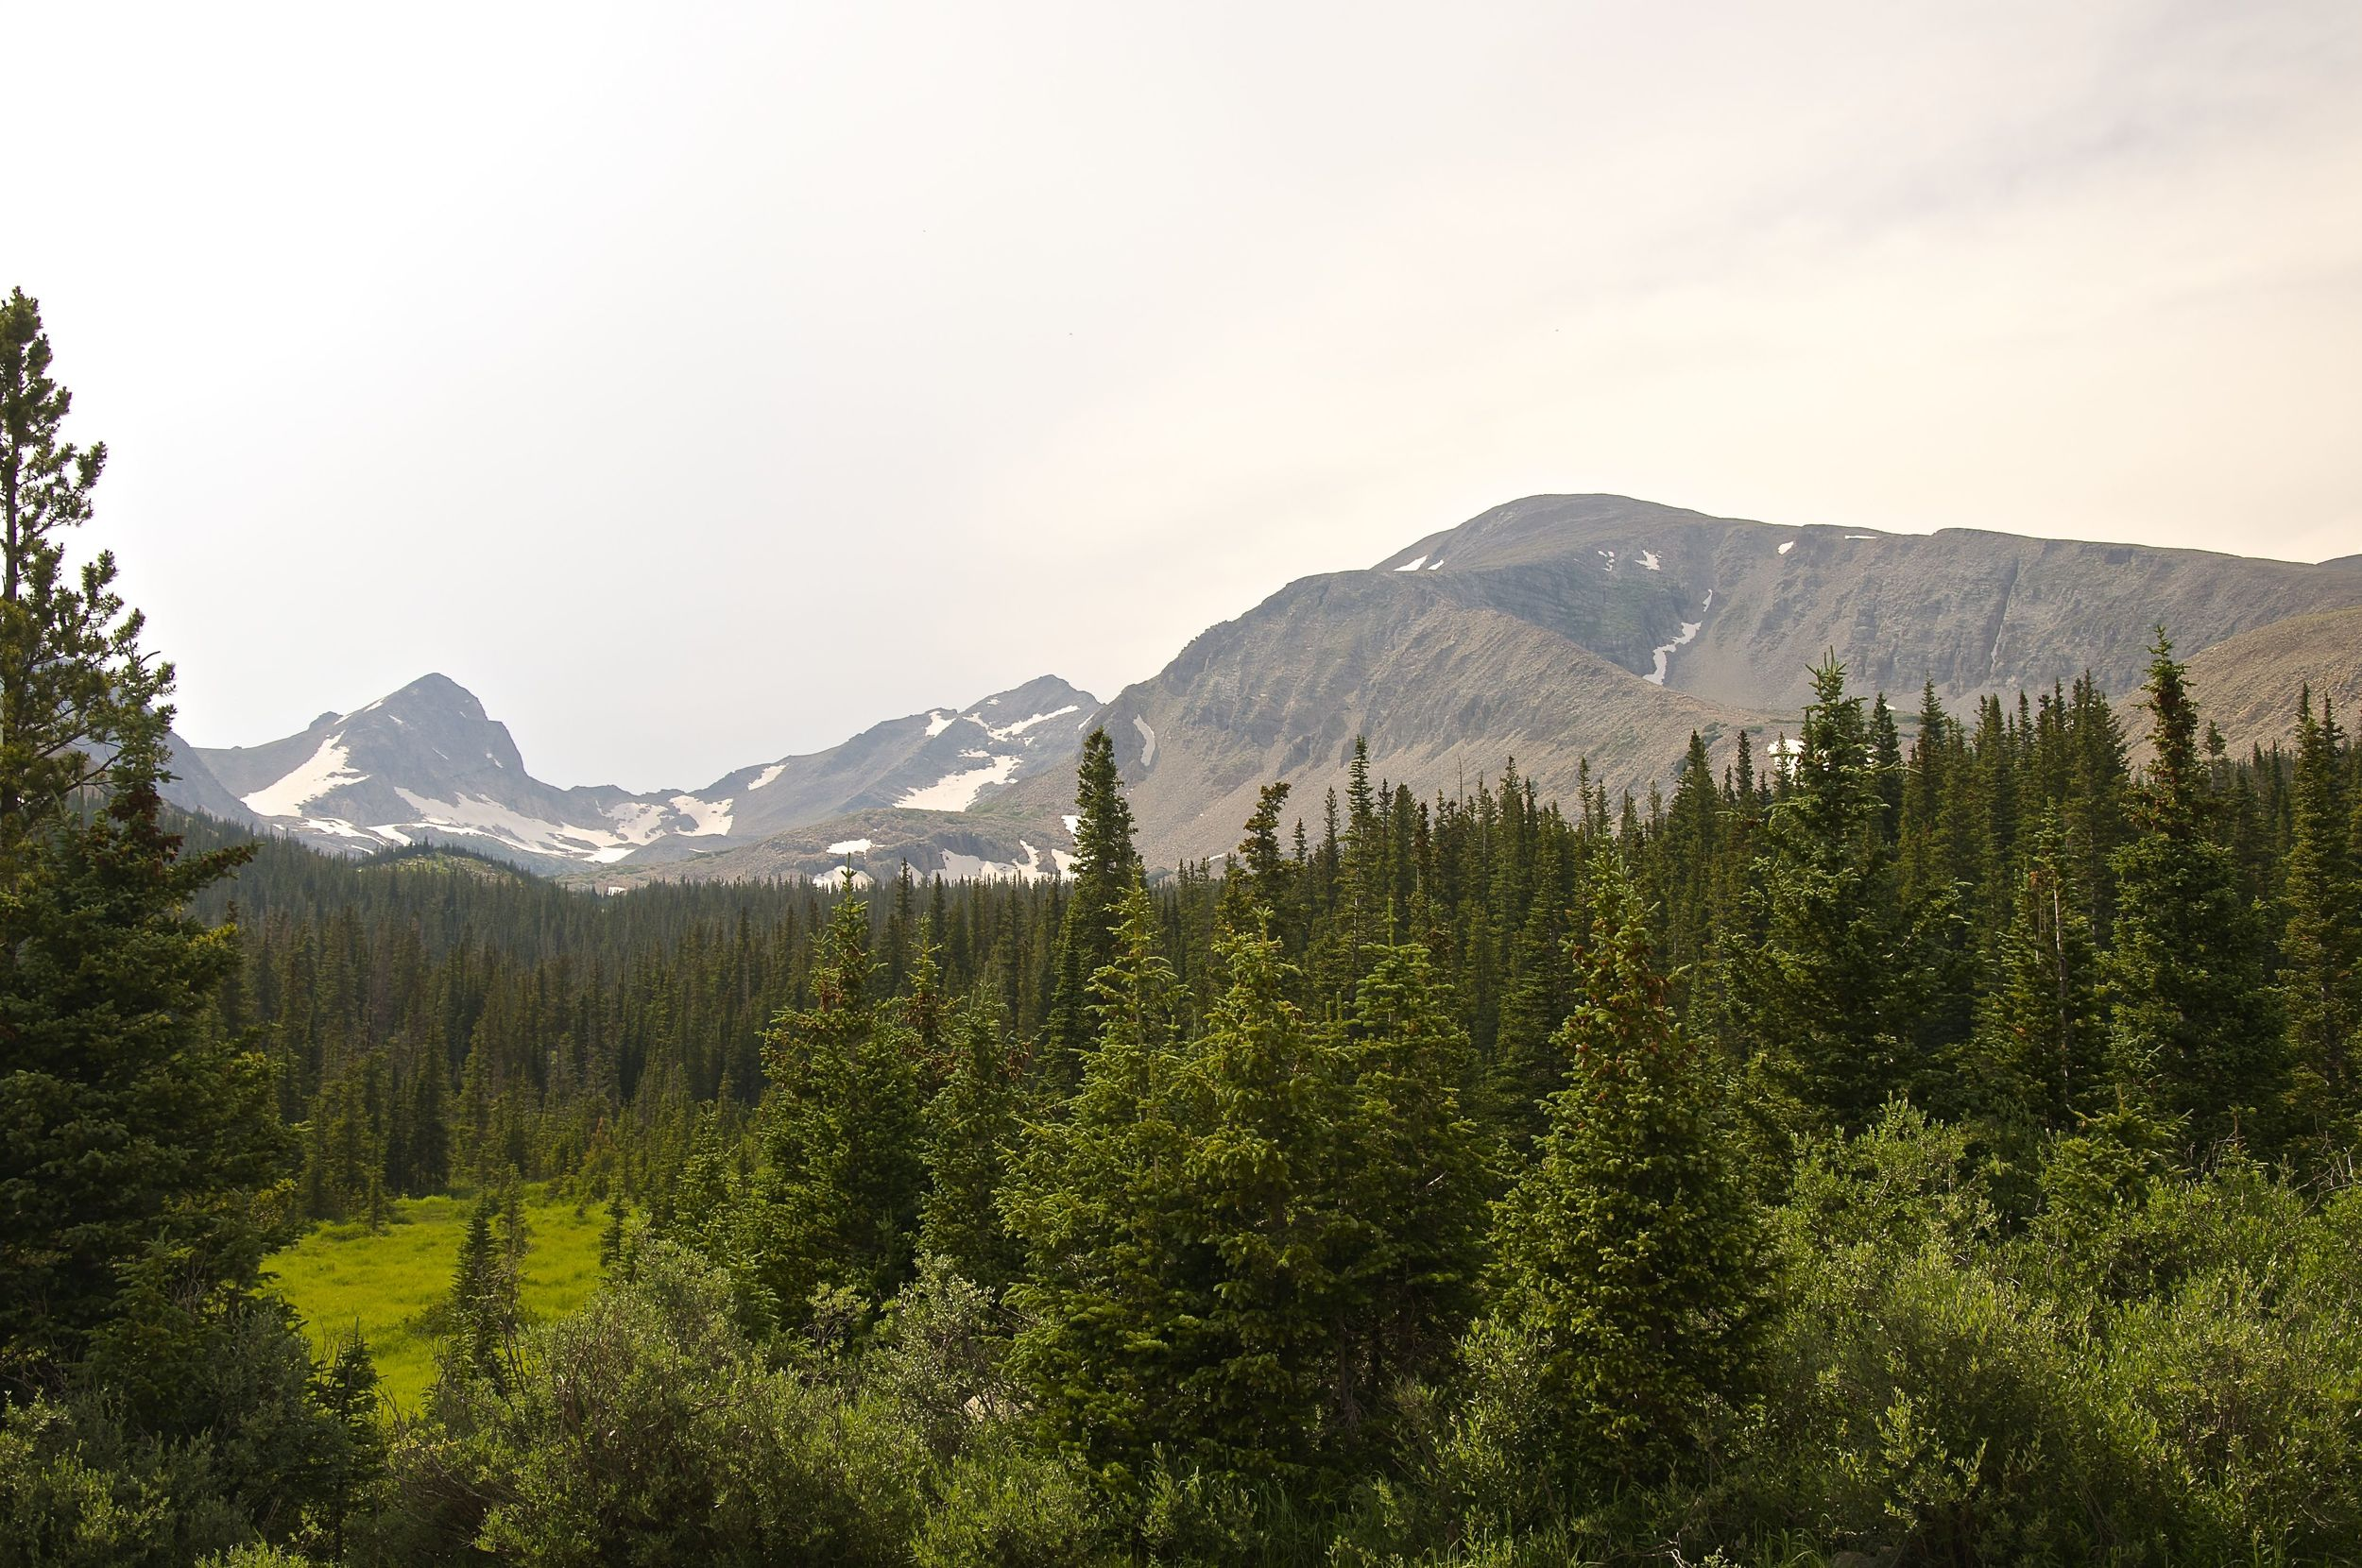 Mt Audubon dwarfing the Indian Peaks from the trailhead.